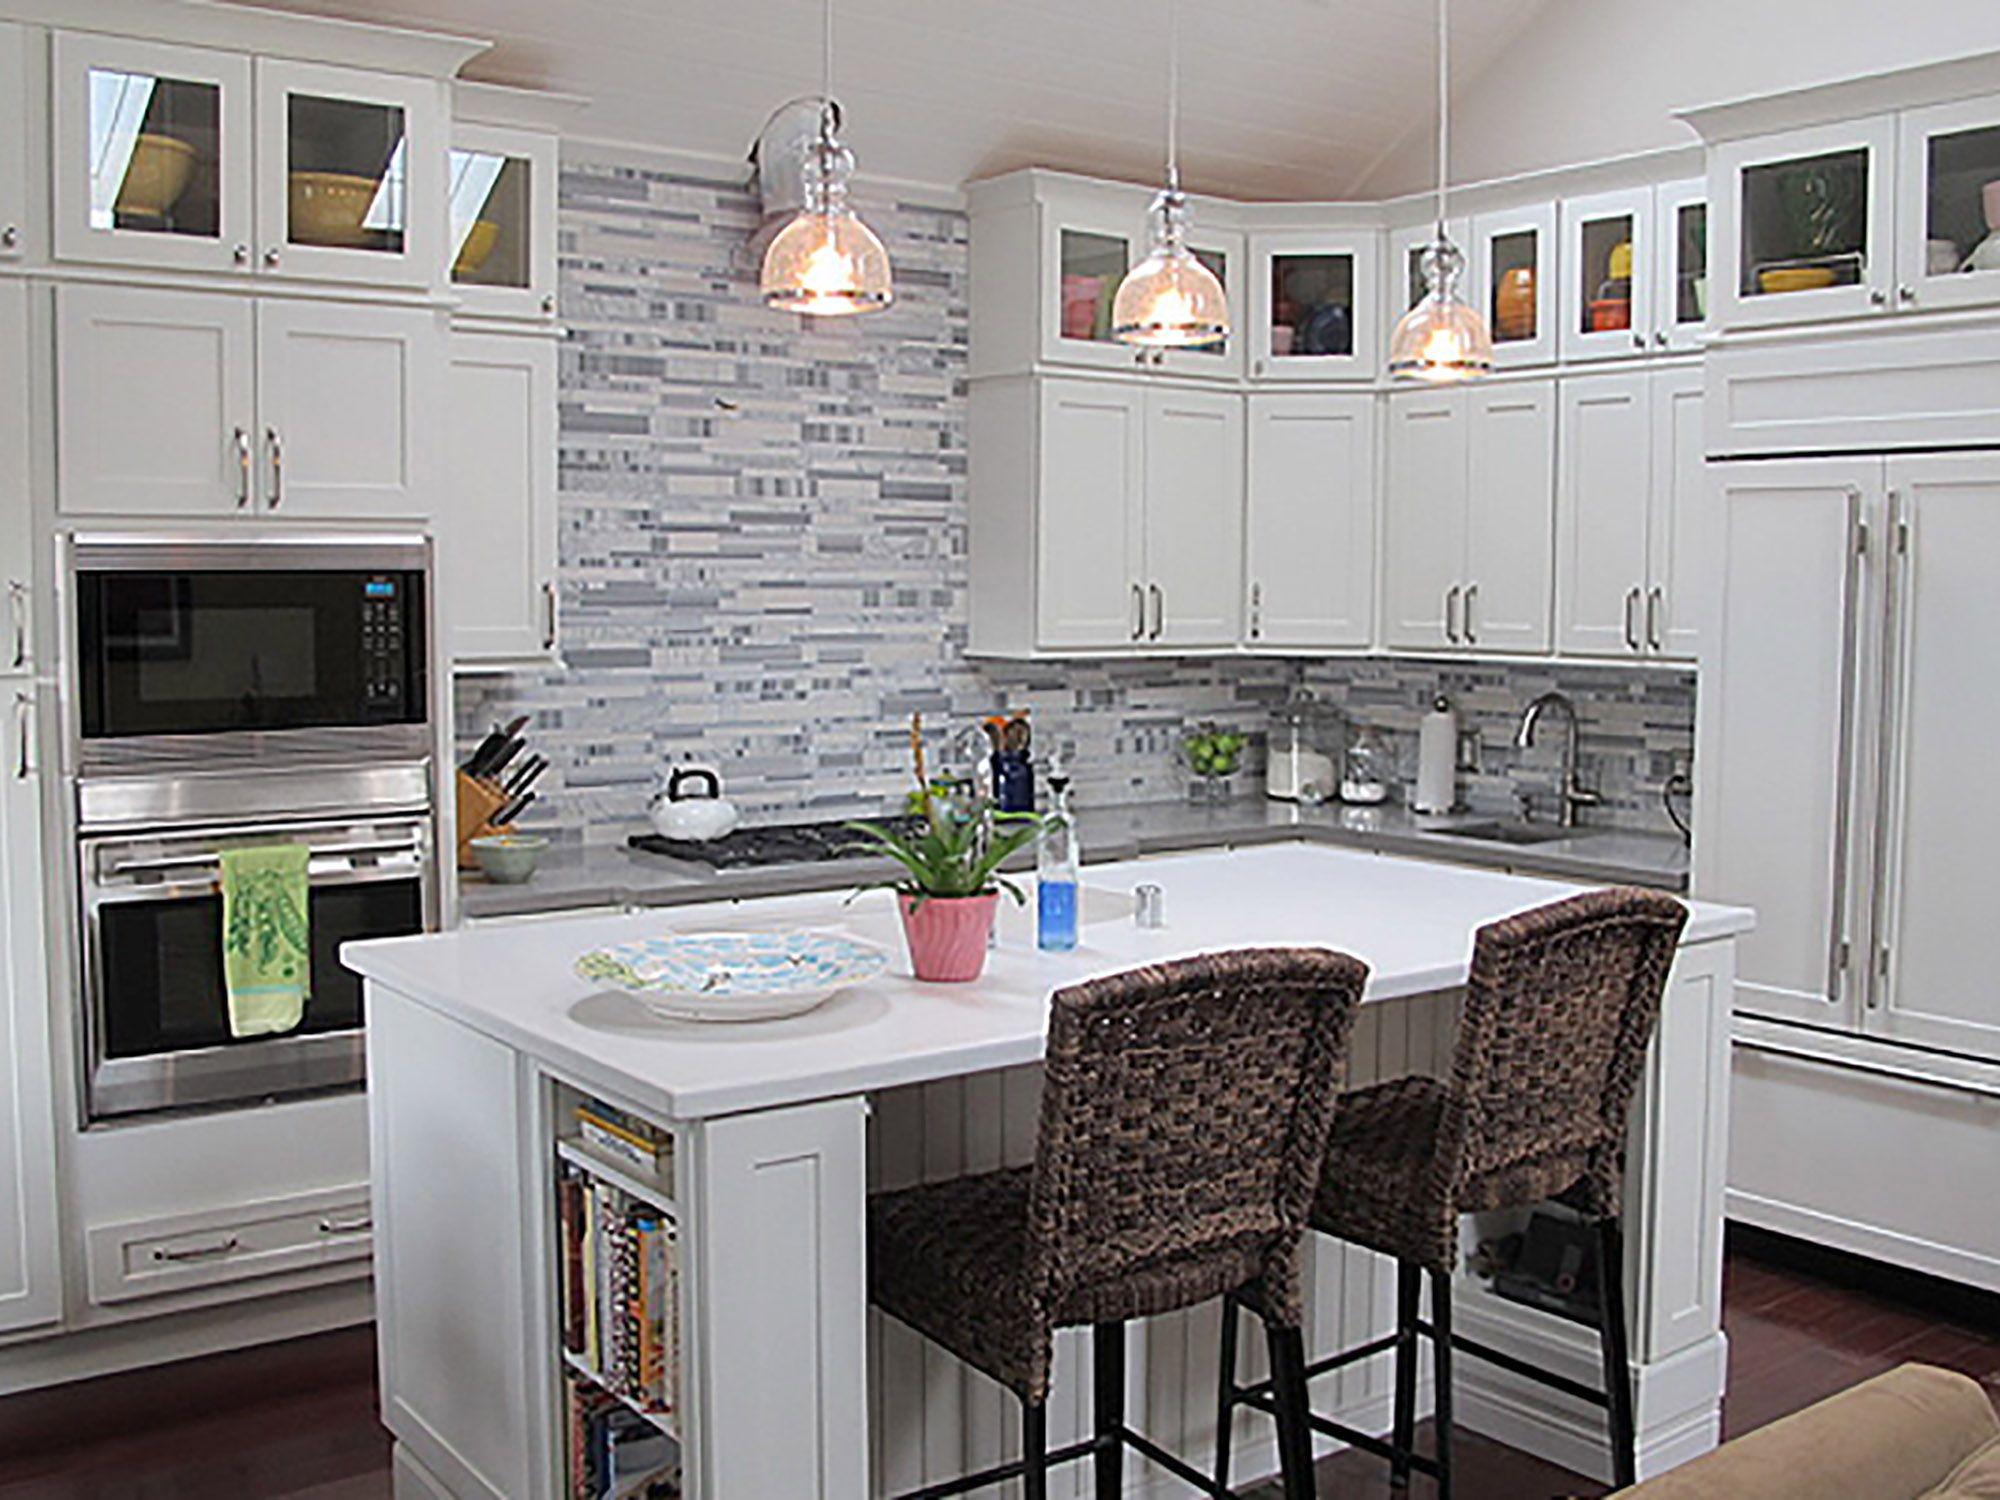 San Francisco Kitchen Renovation Features Cliqstudios Dayton Gorgeous Basic Kitchen Cabinets Review